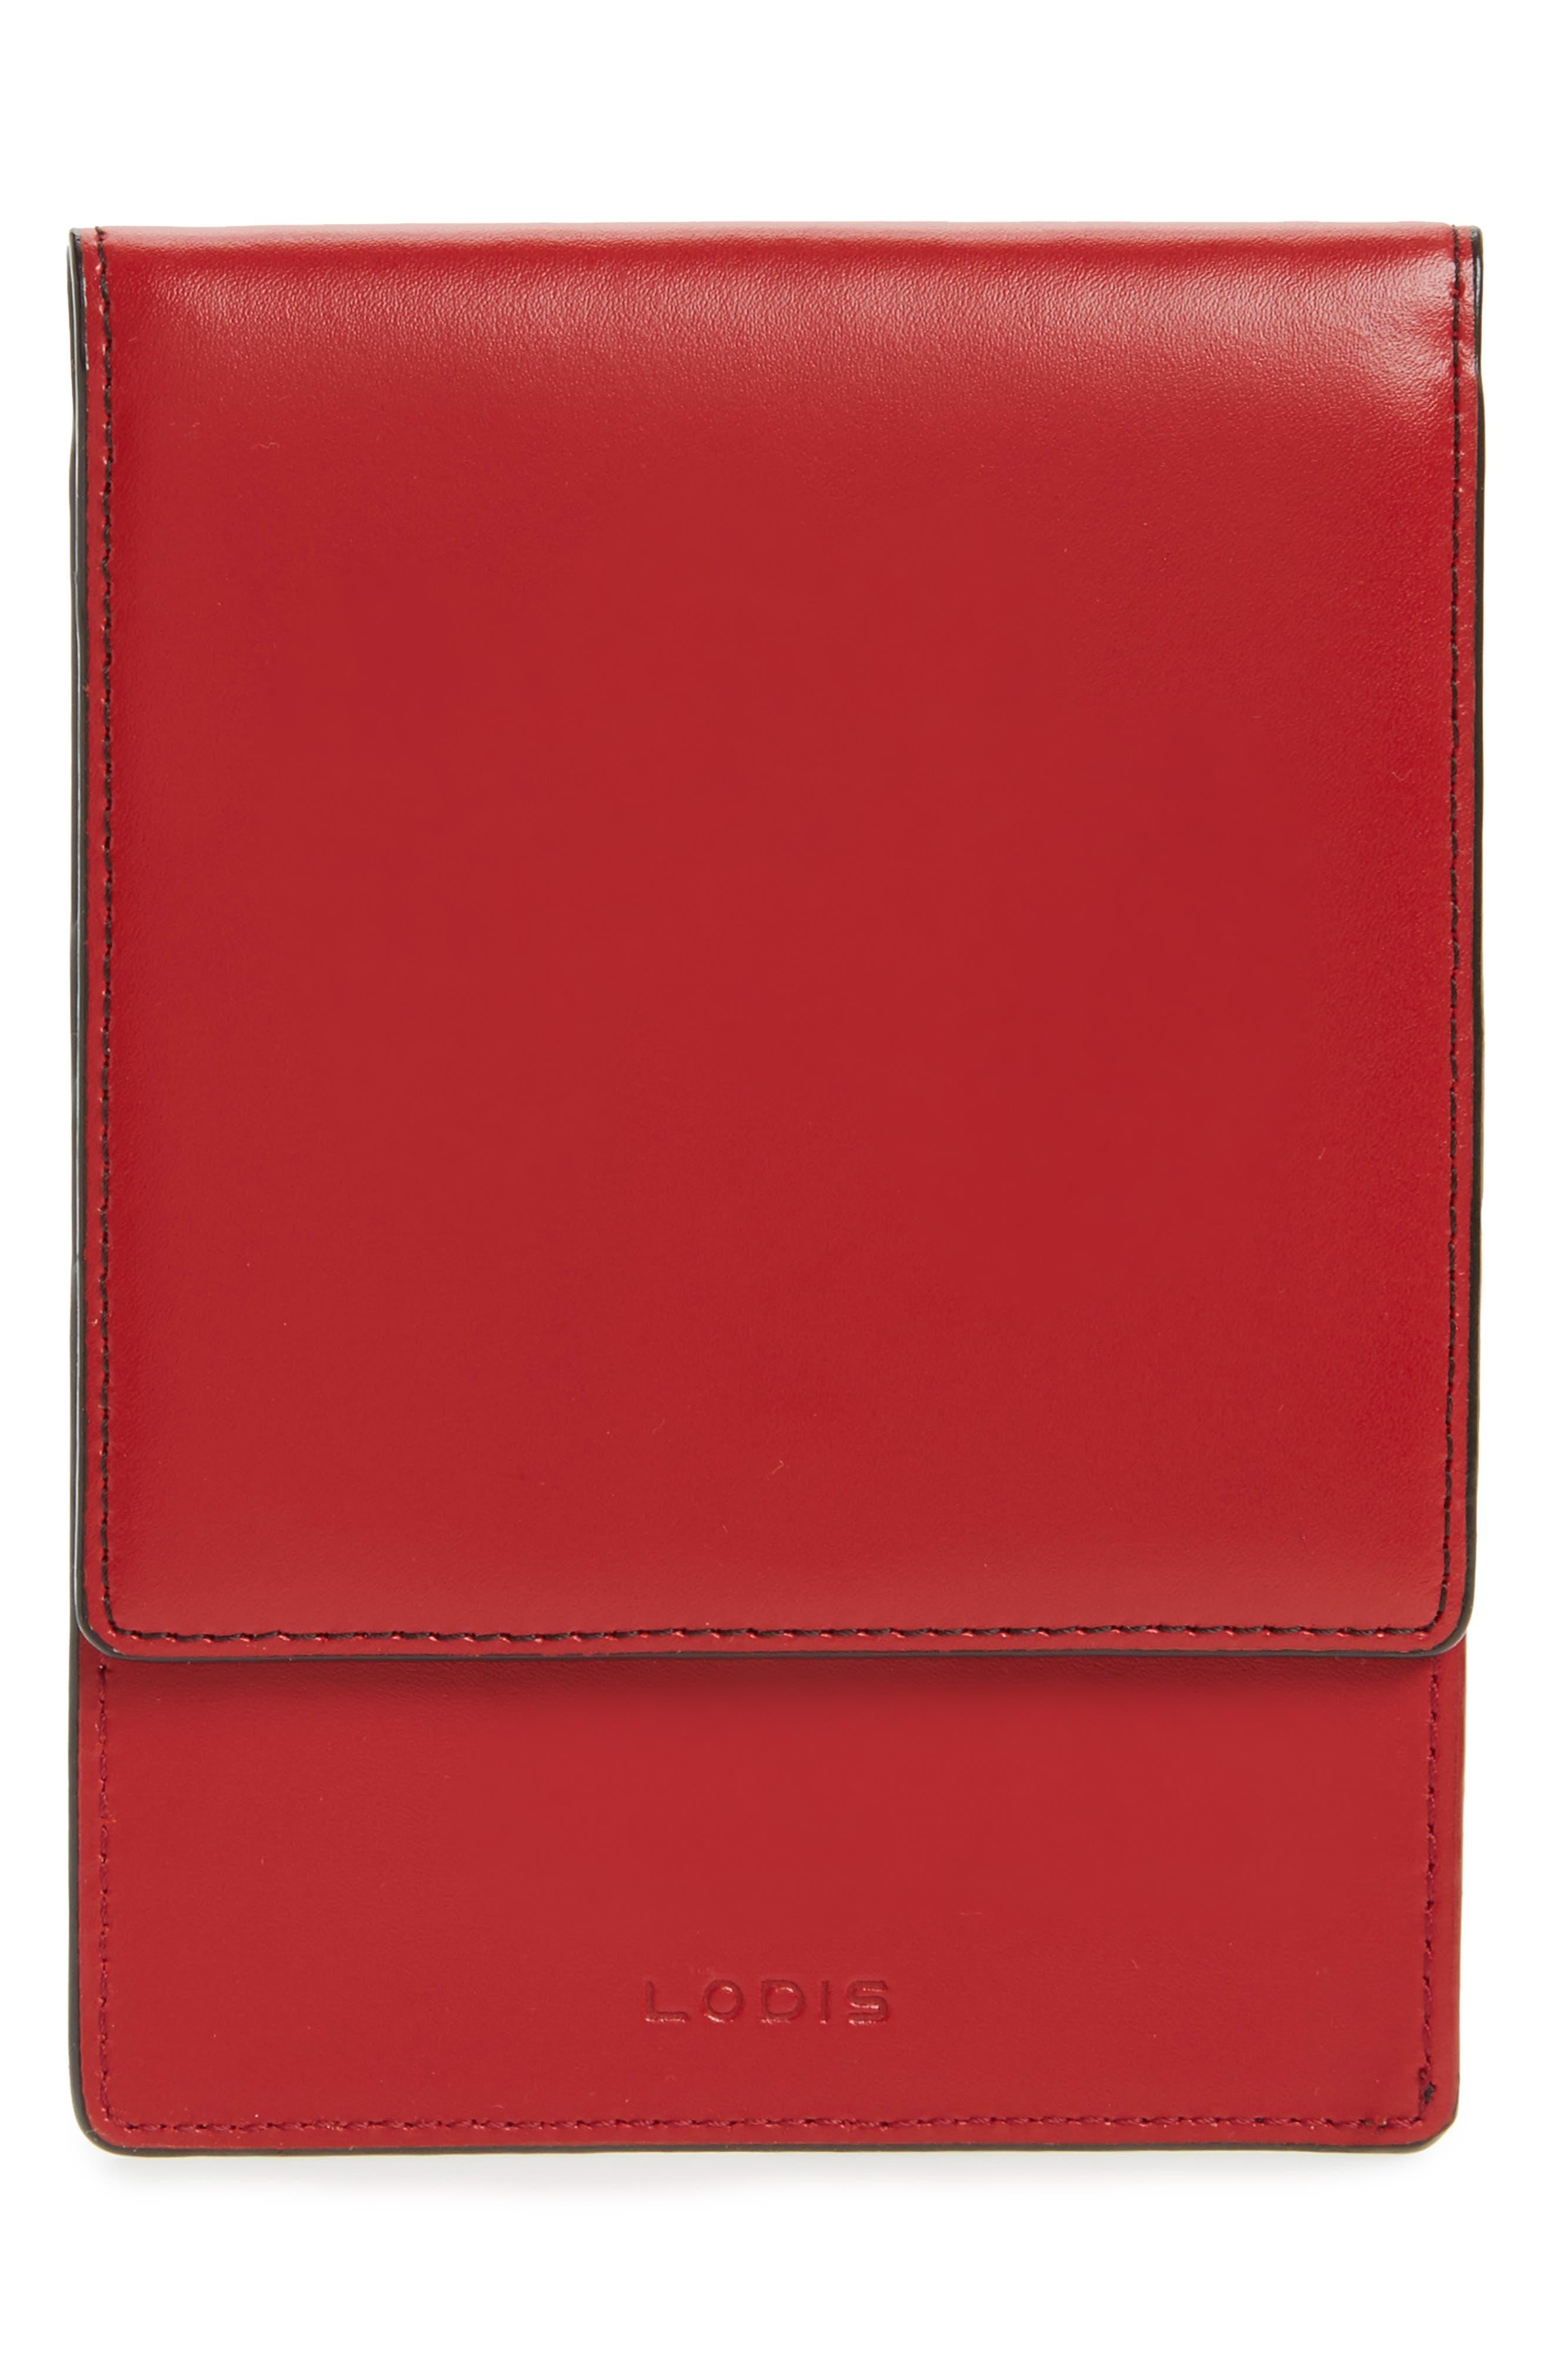 LODIS Audrey Under Lock & Key Skyler Leather Passport Wallet